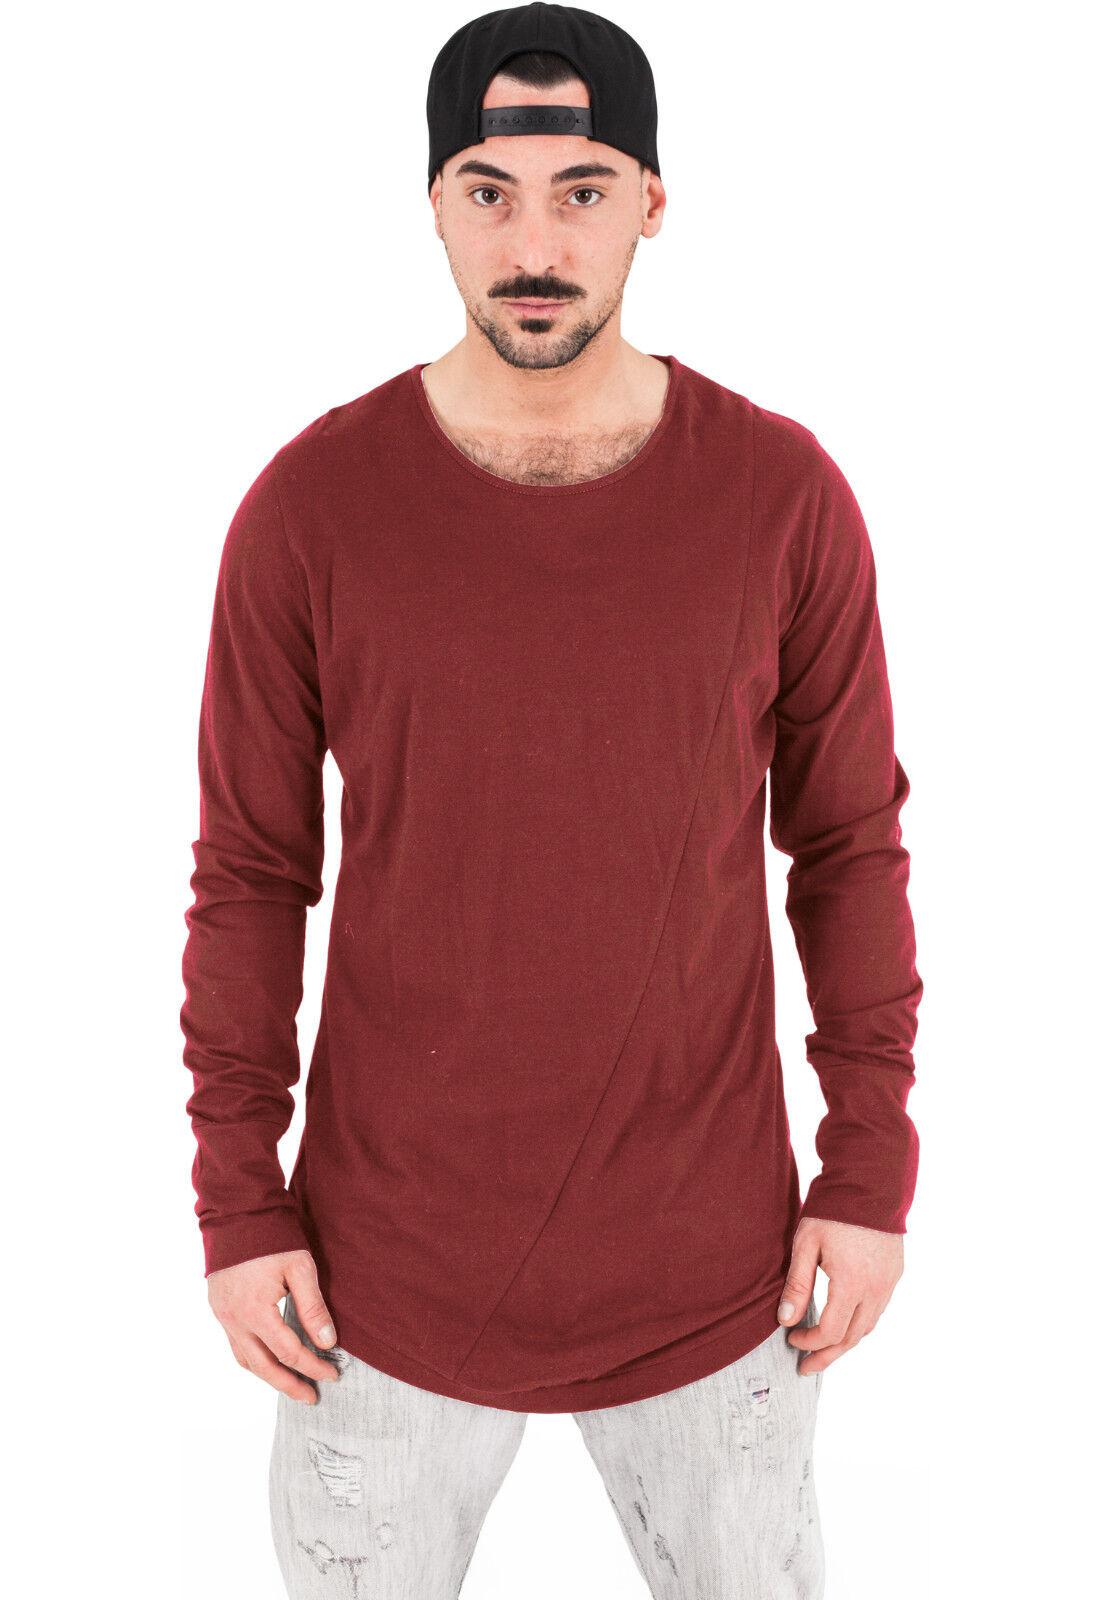 c25a6b6b8c4a Urban Classics Herren longsleeve Shirt extra lang long Shirt ...